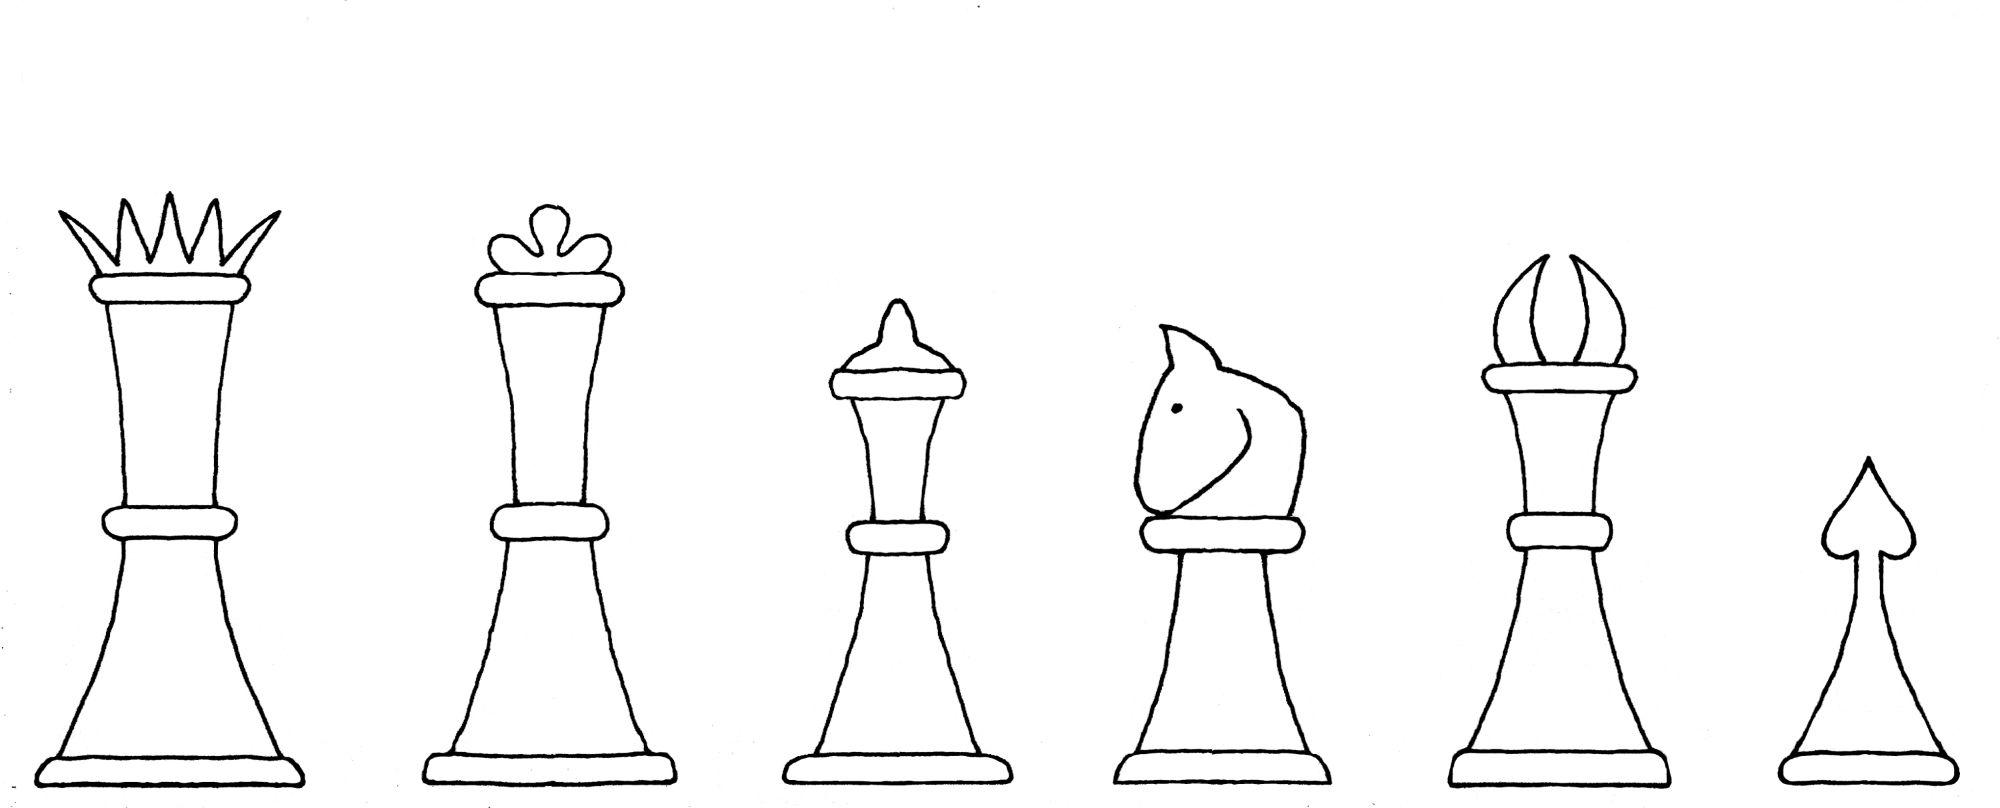 Lucena chess set interpretive diagram